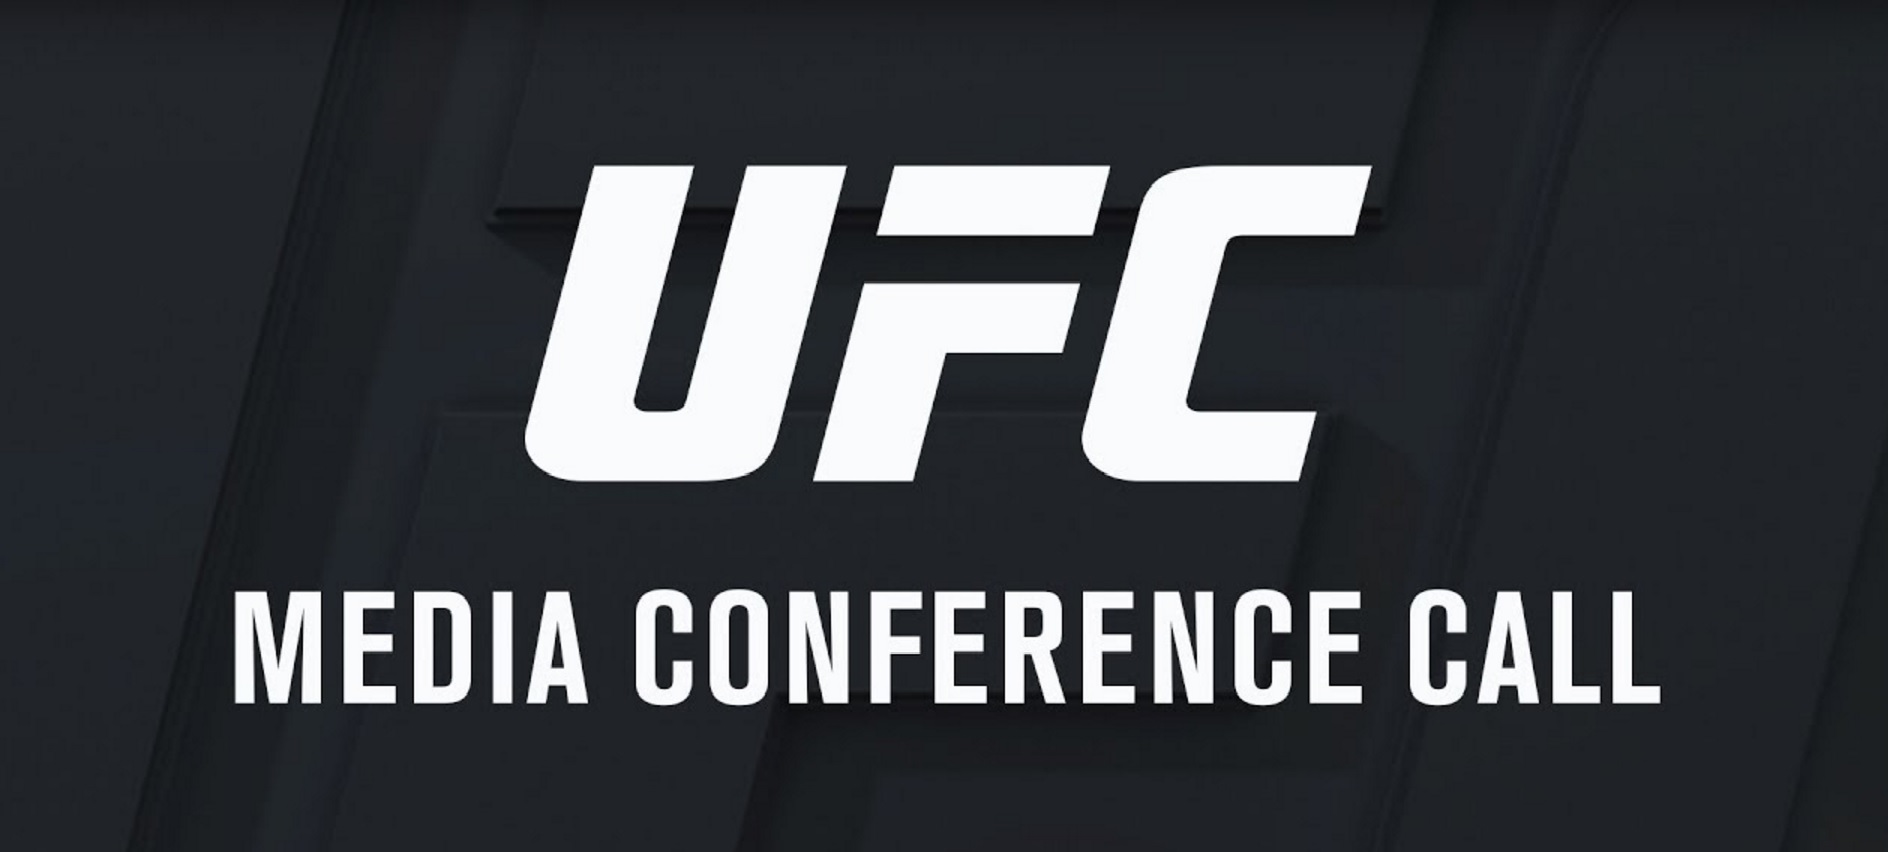 UFC MEDIA CONFERENCE CALLq